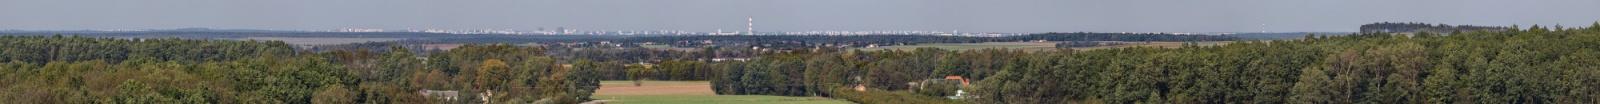 BD-panorama-male.thumb.jpg.1bf658f72d16b028c3e78e95318b483e.jpg